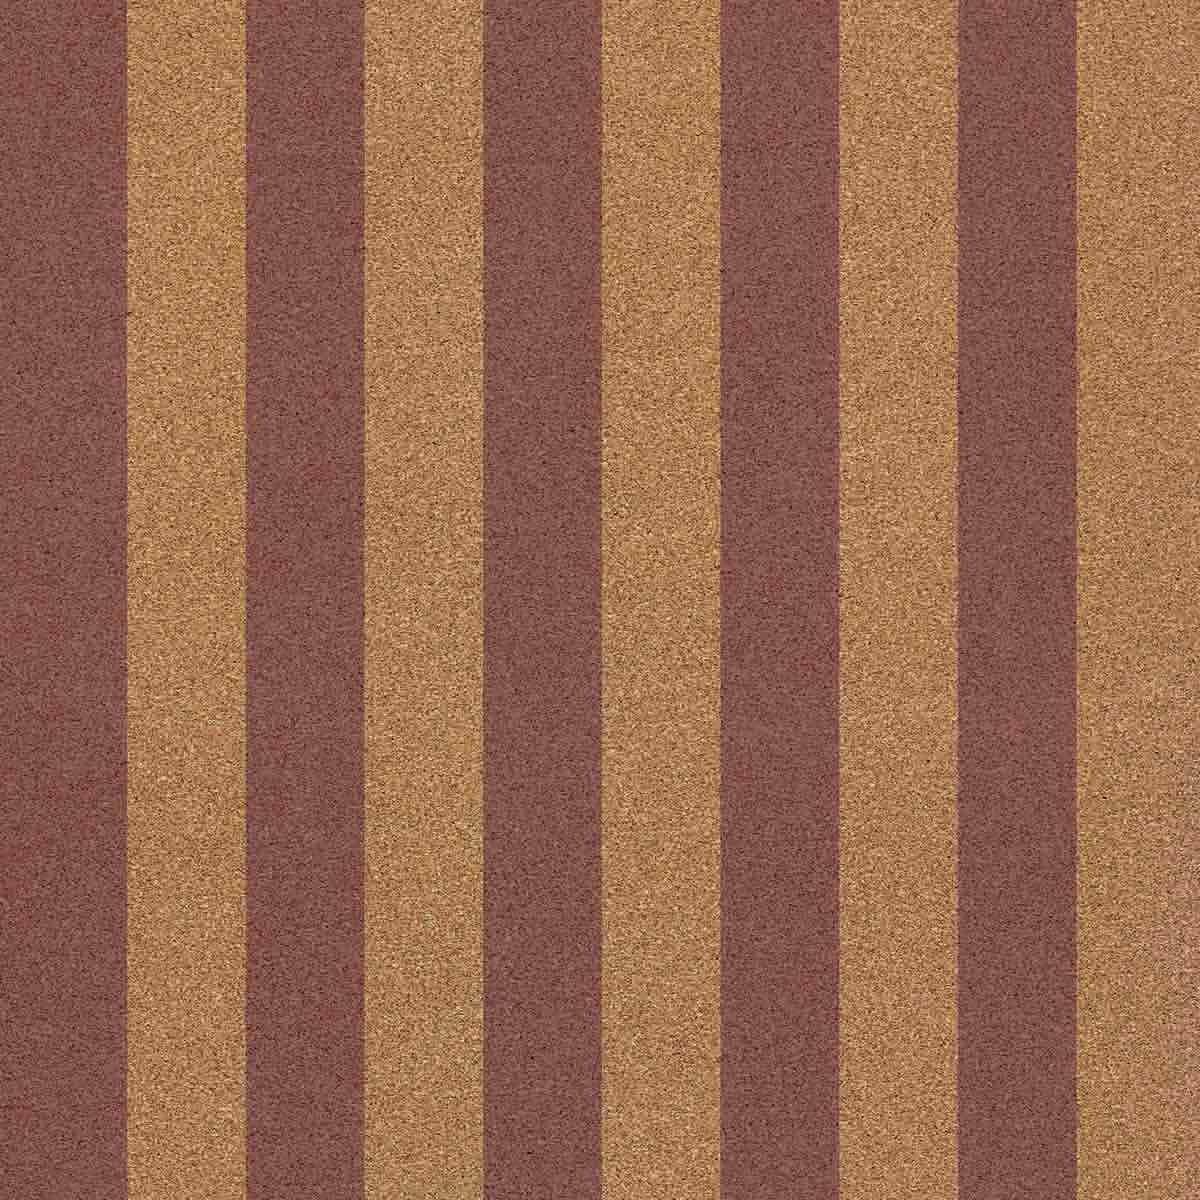 Carta da Parati in Sughero 0,5 mm - Straight Marine African Violet Cork